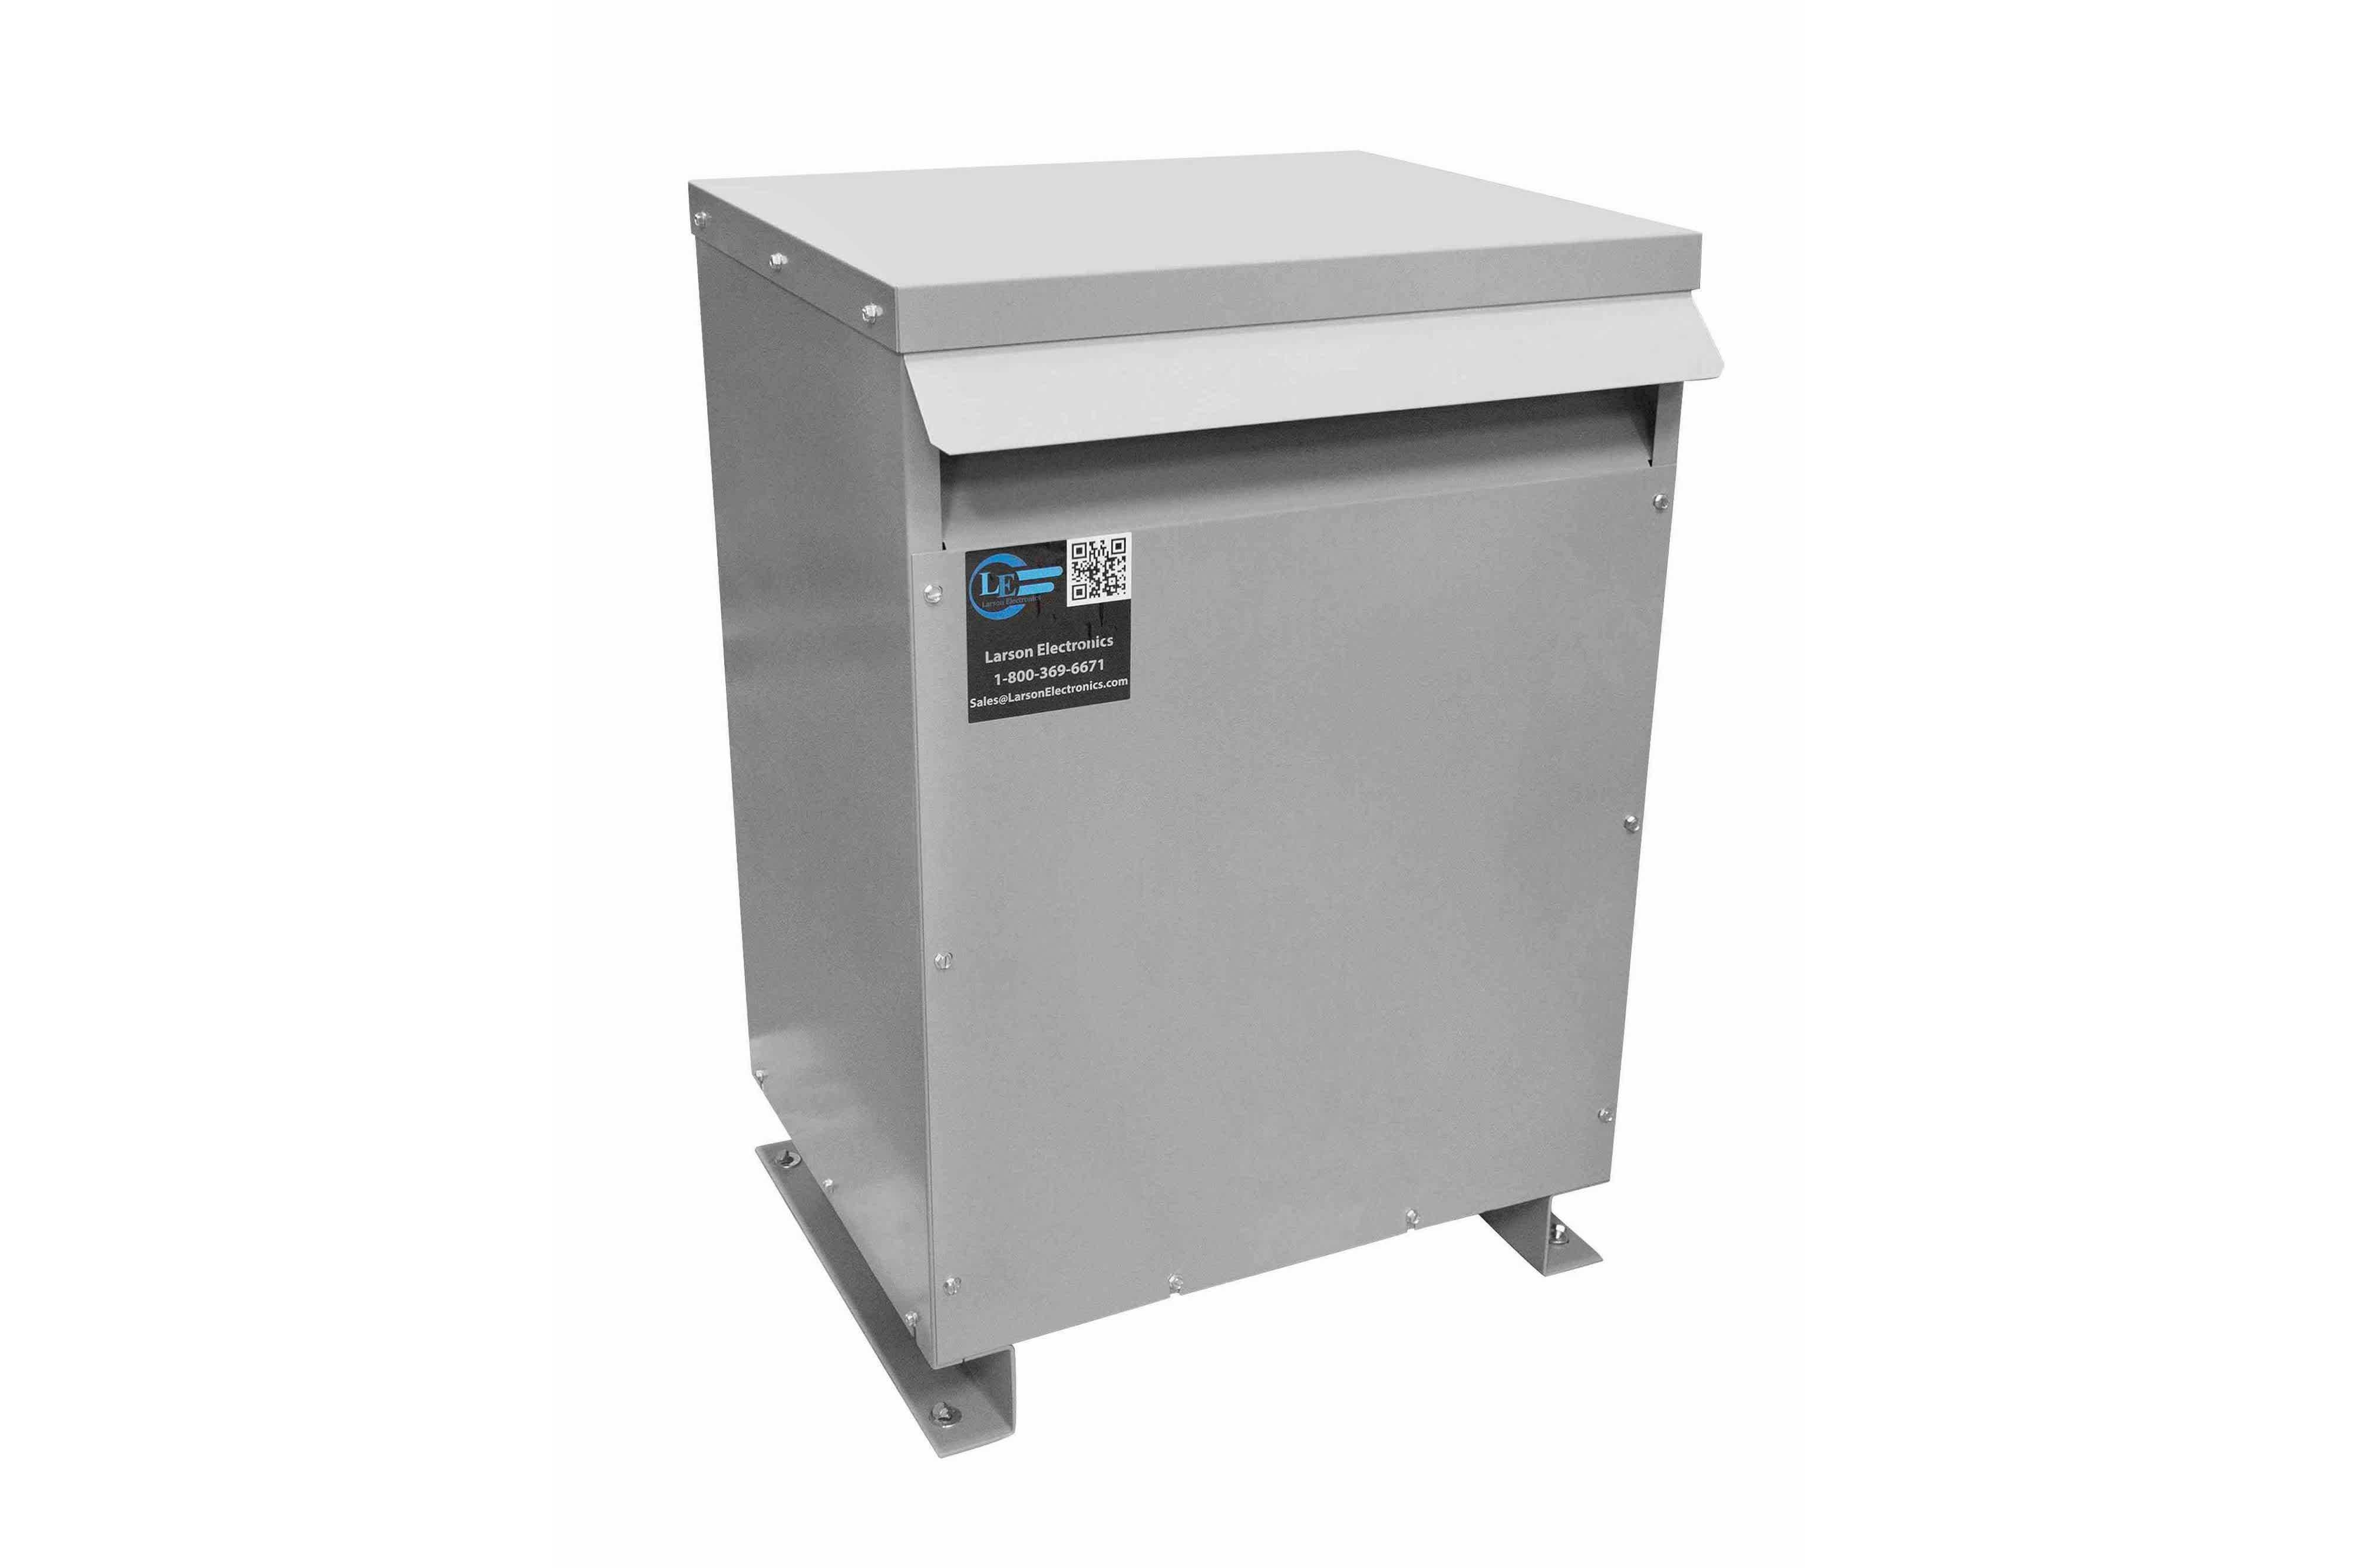 18 kVA 3PH Isolation Transformer, 460V Wye Primary, 415V Delta Secondary, N3R, Ventilated, 60 Hz